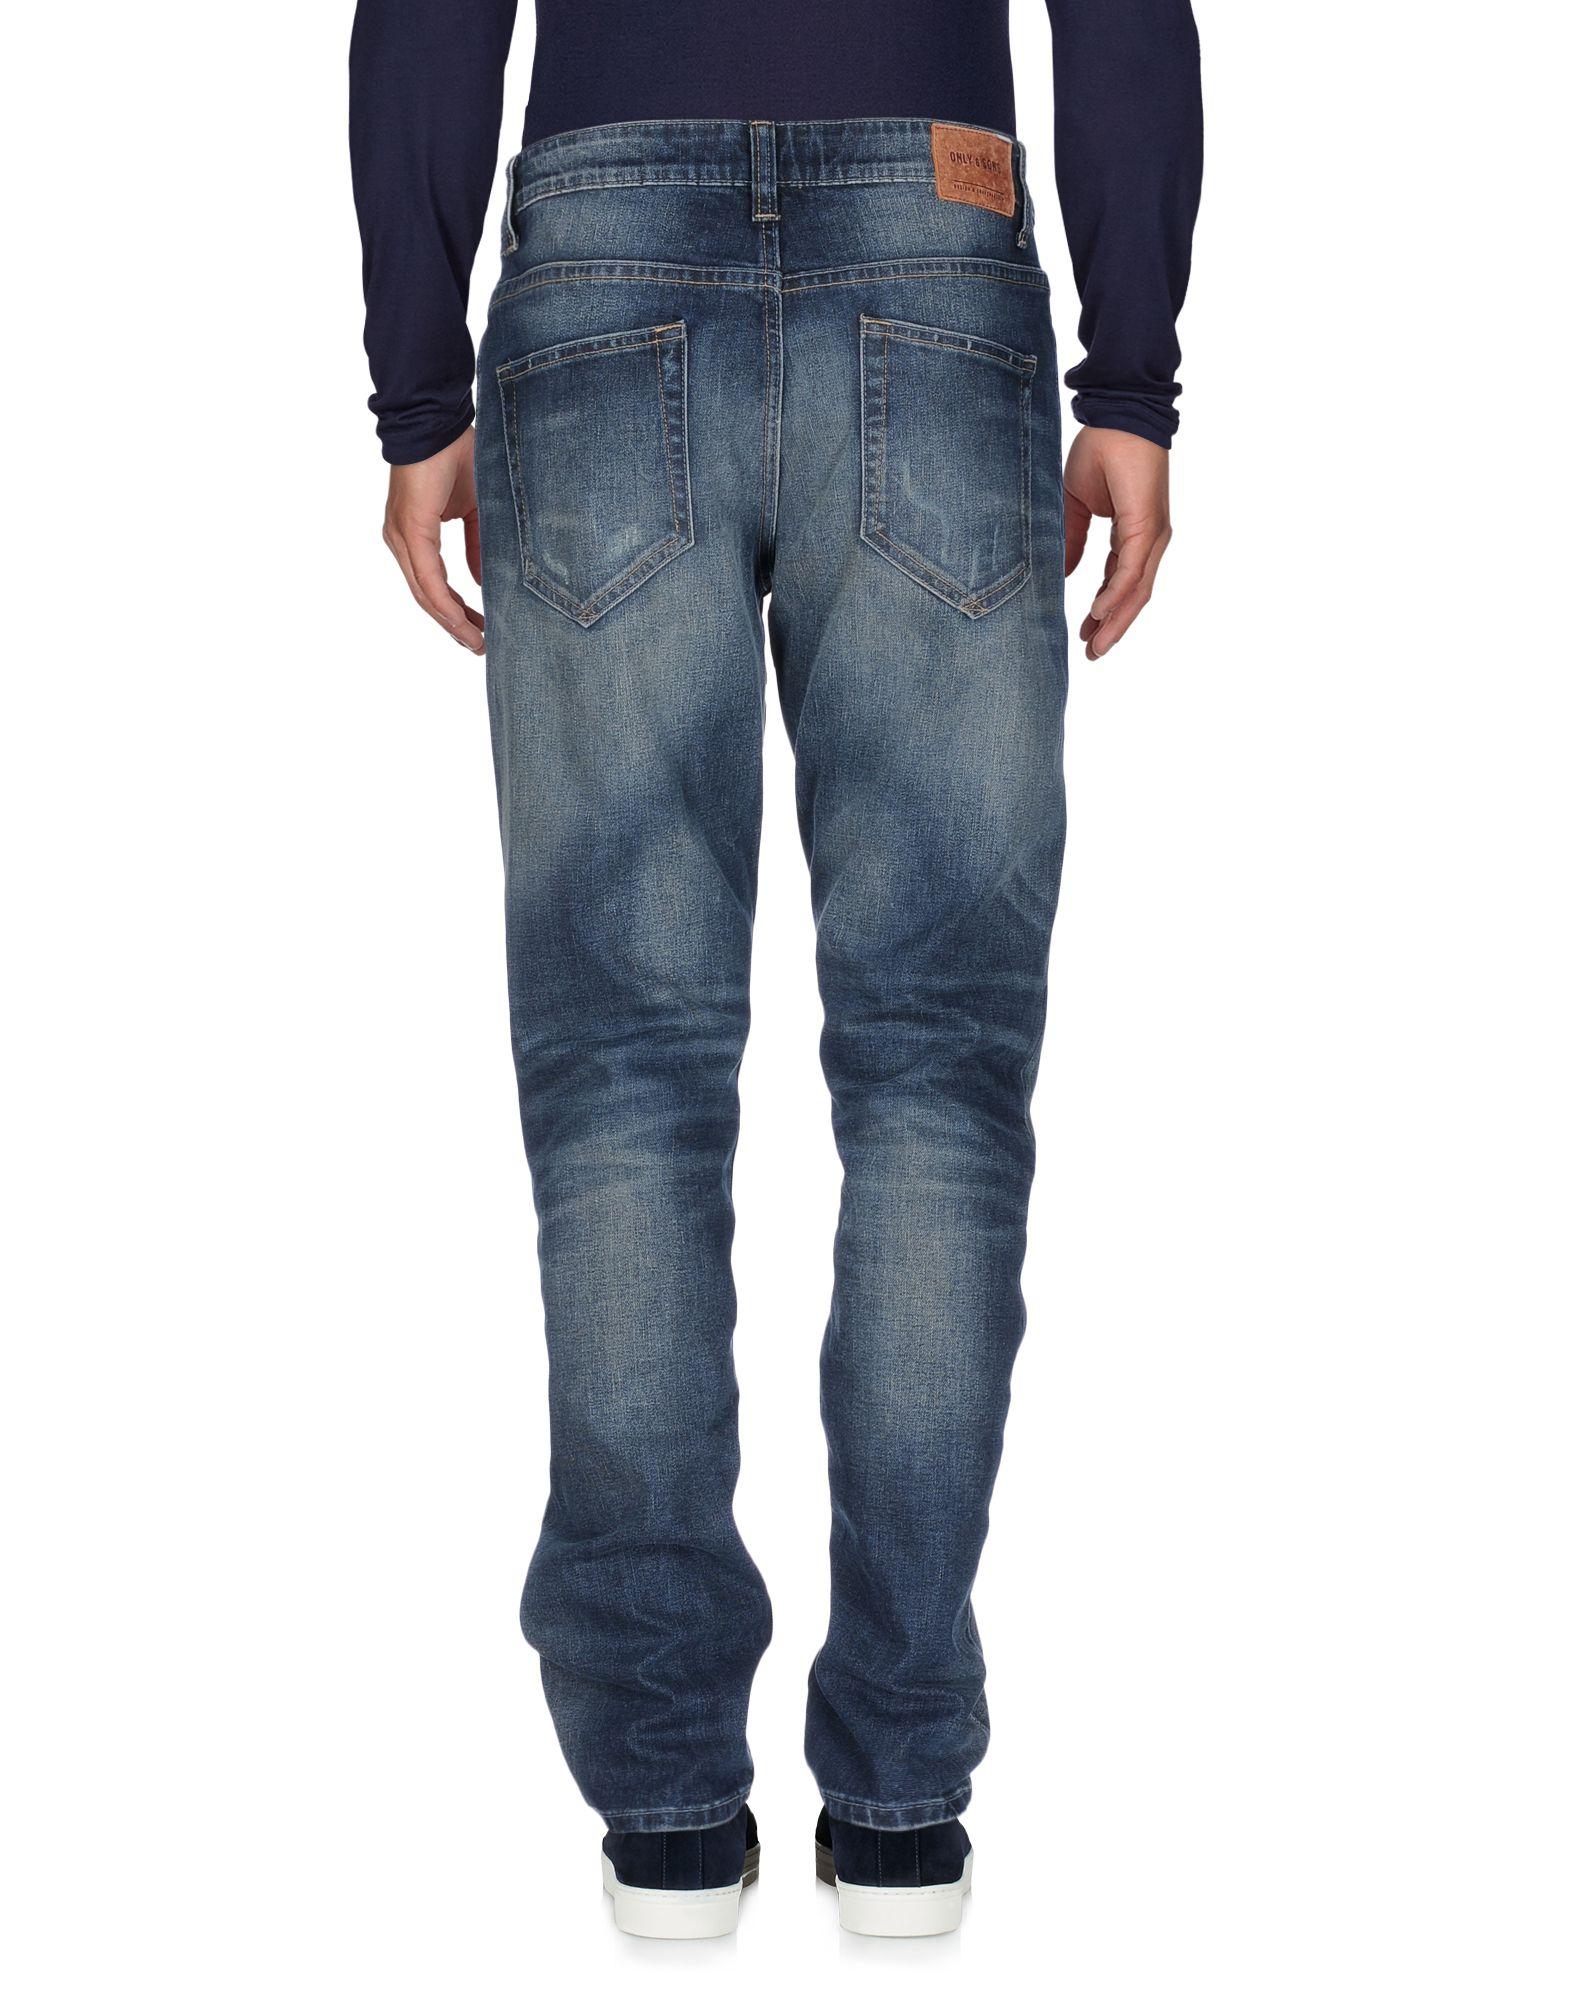 Pantaloni Jeans 42625372VN Only & Sons Uomo - 42625372VN Jeans 1581a4